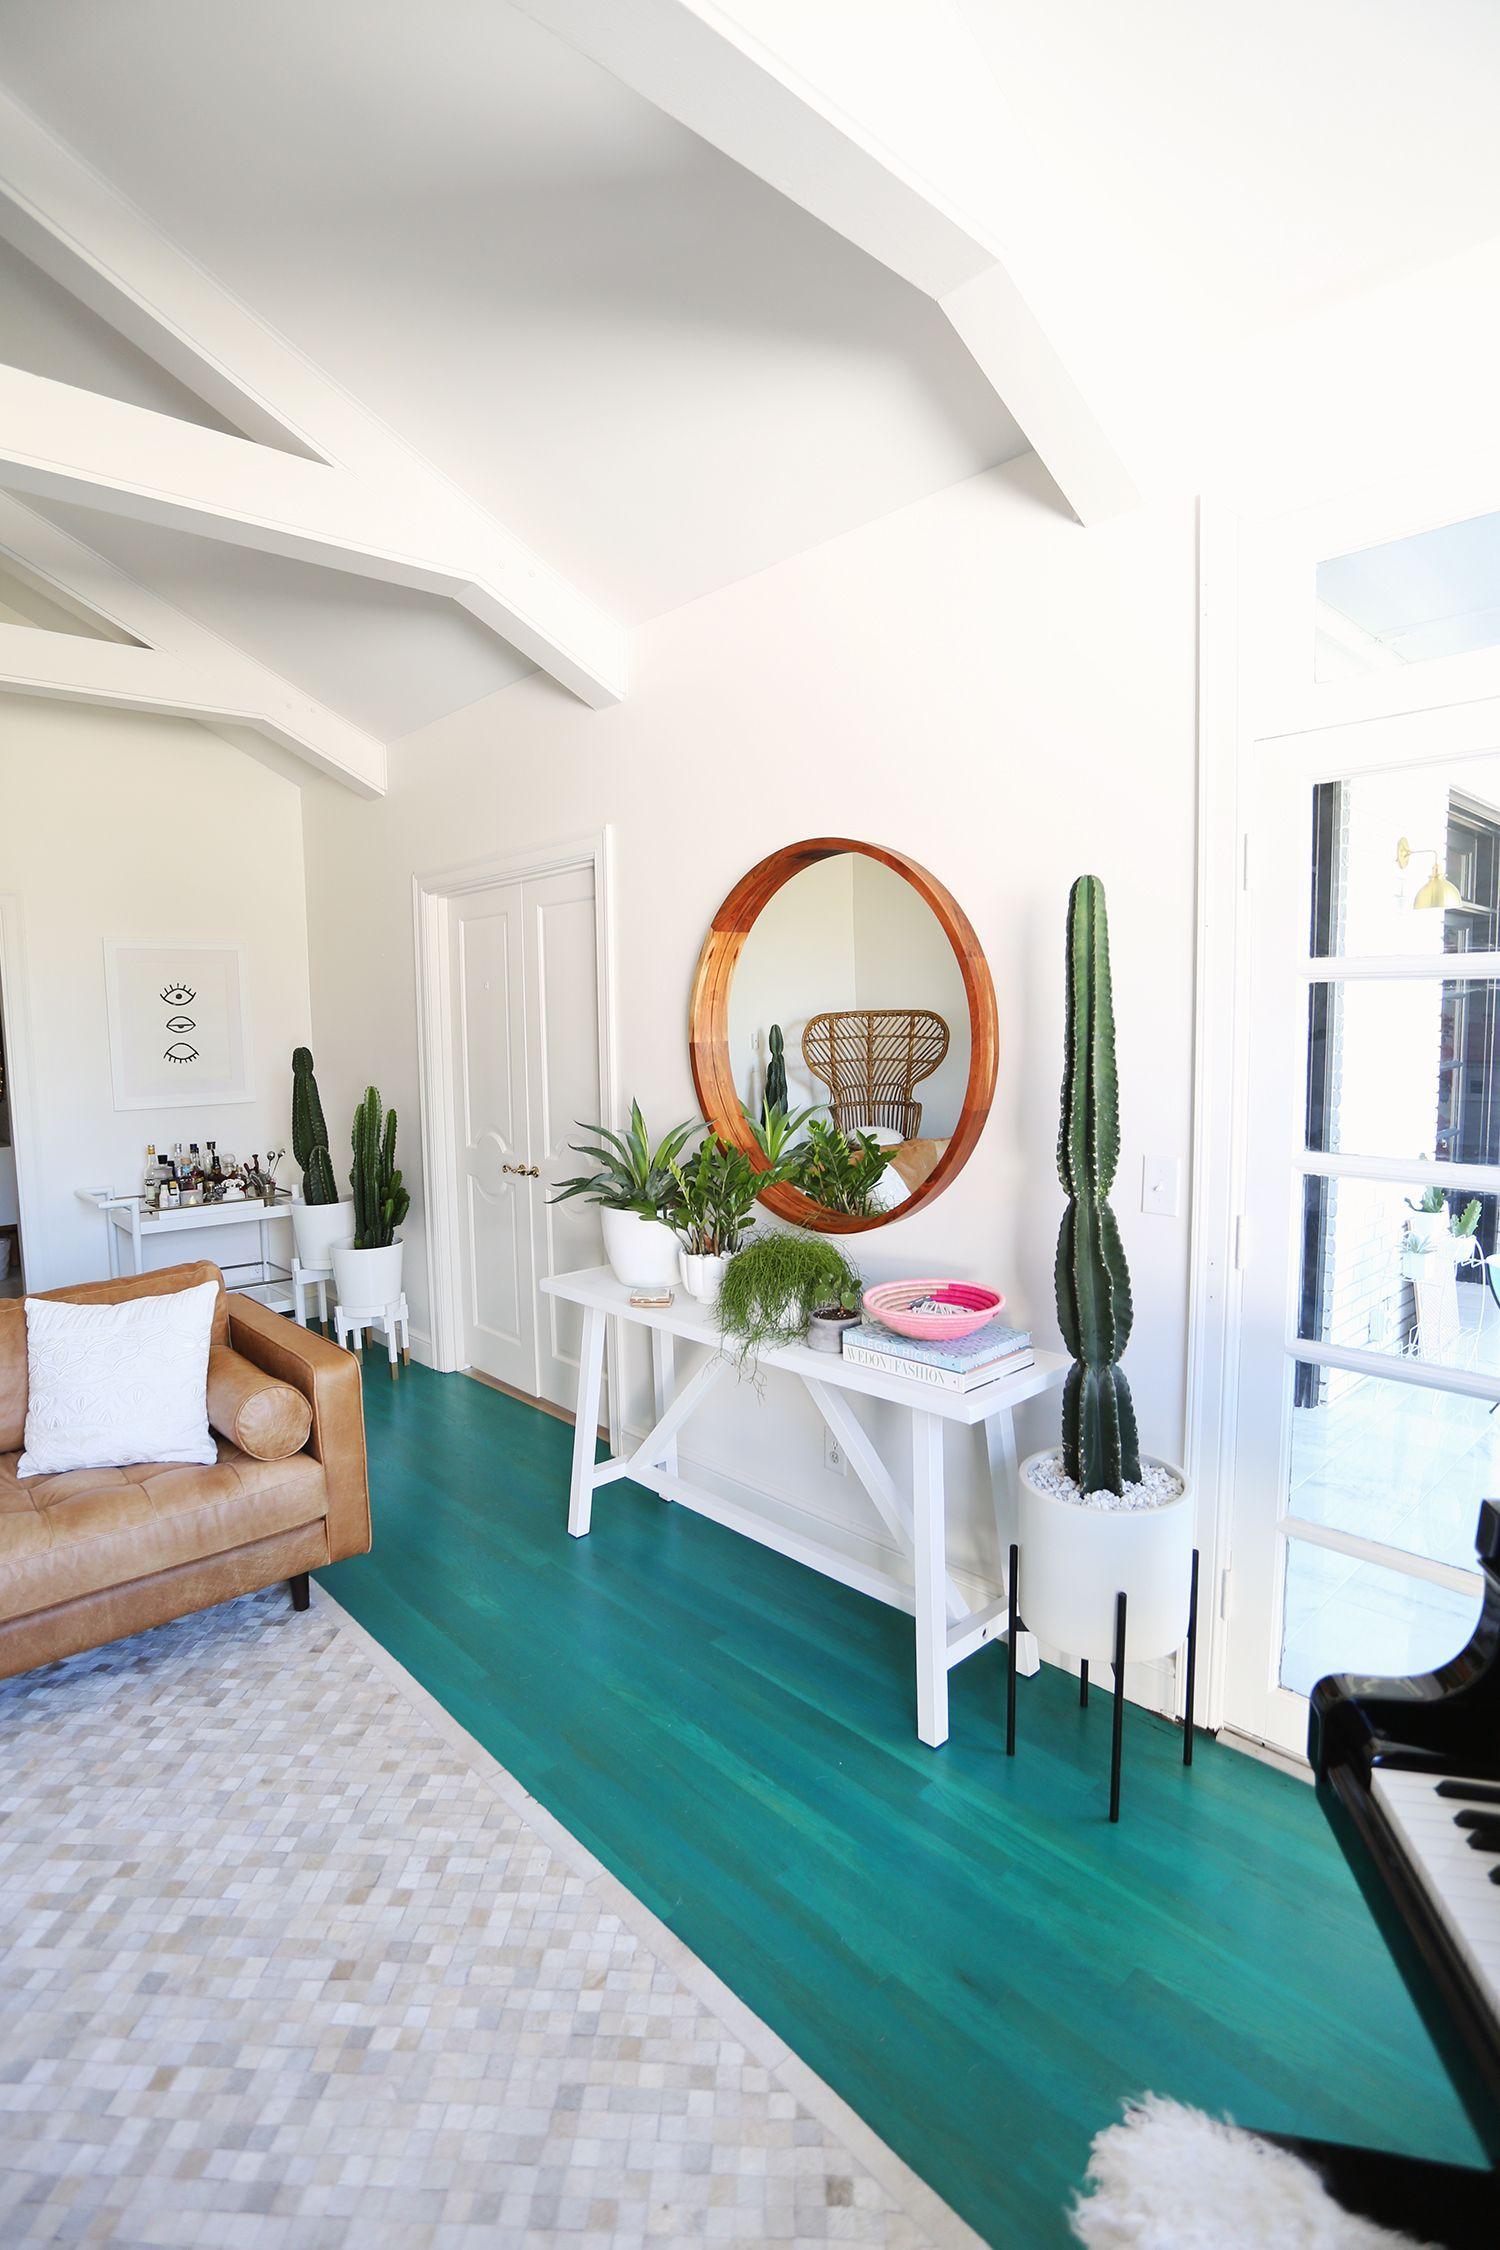 Color Washed Floors Elsie Larson S Living Room Tour Turquoise Living Room Decor Decor Home Decor Turquoise floor bedroom designs